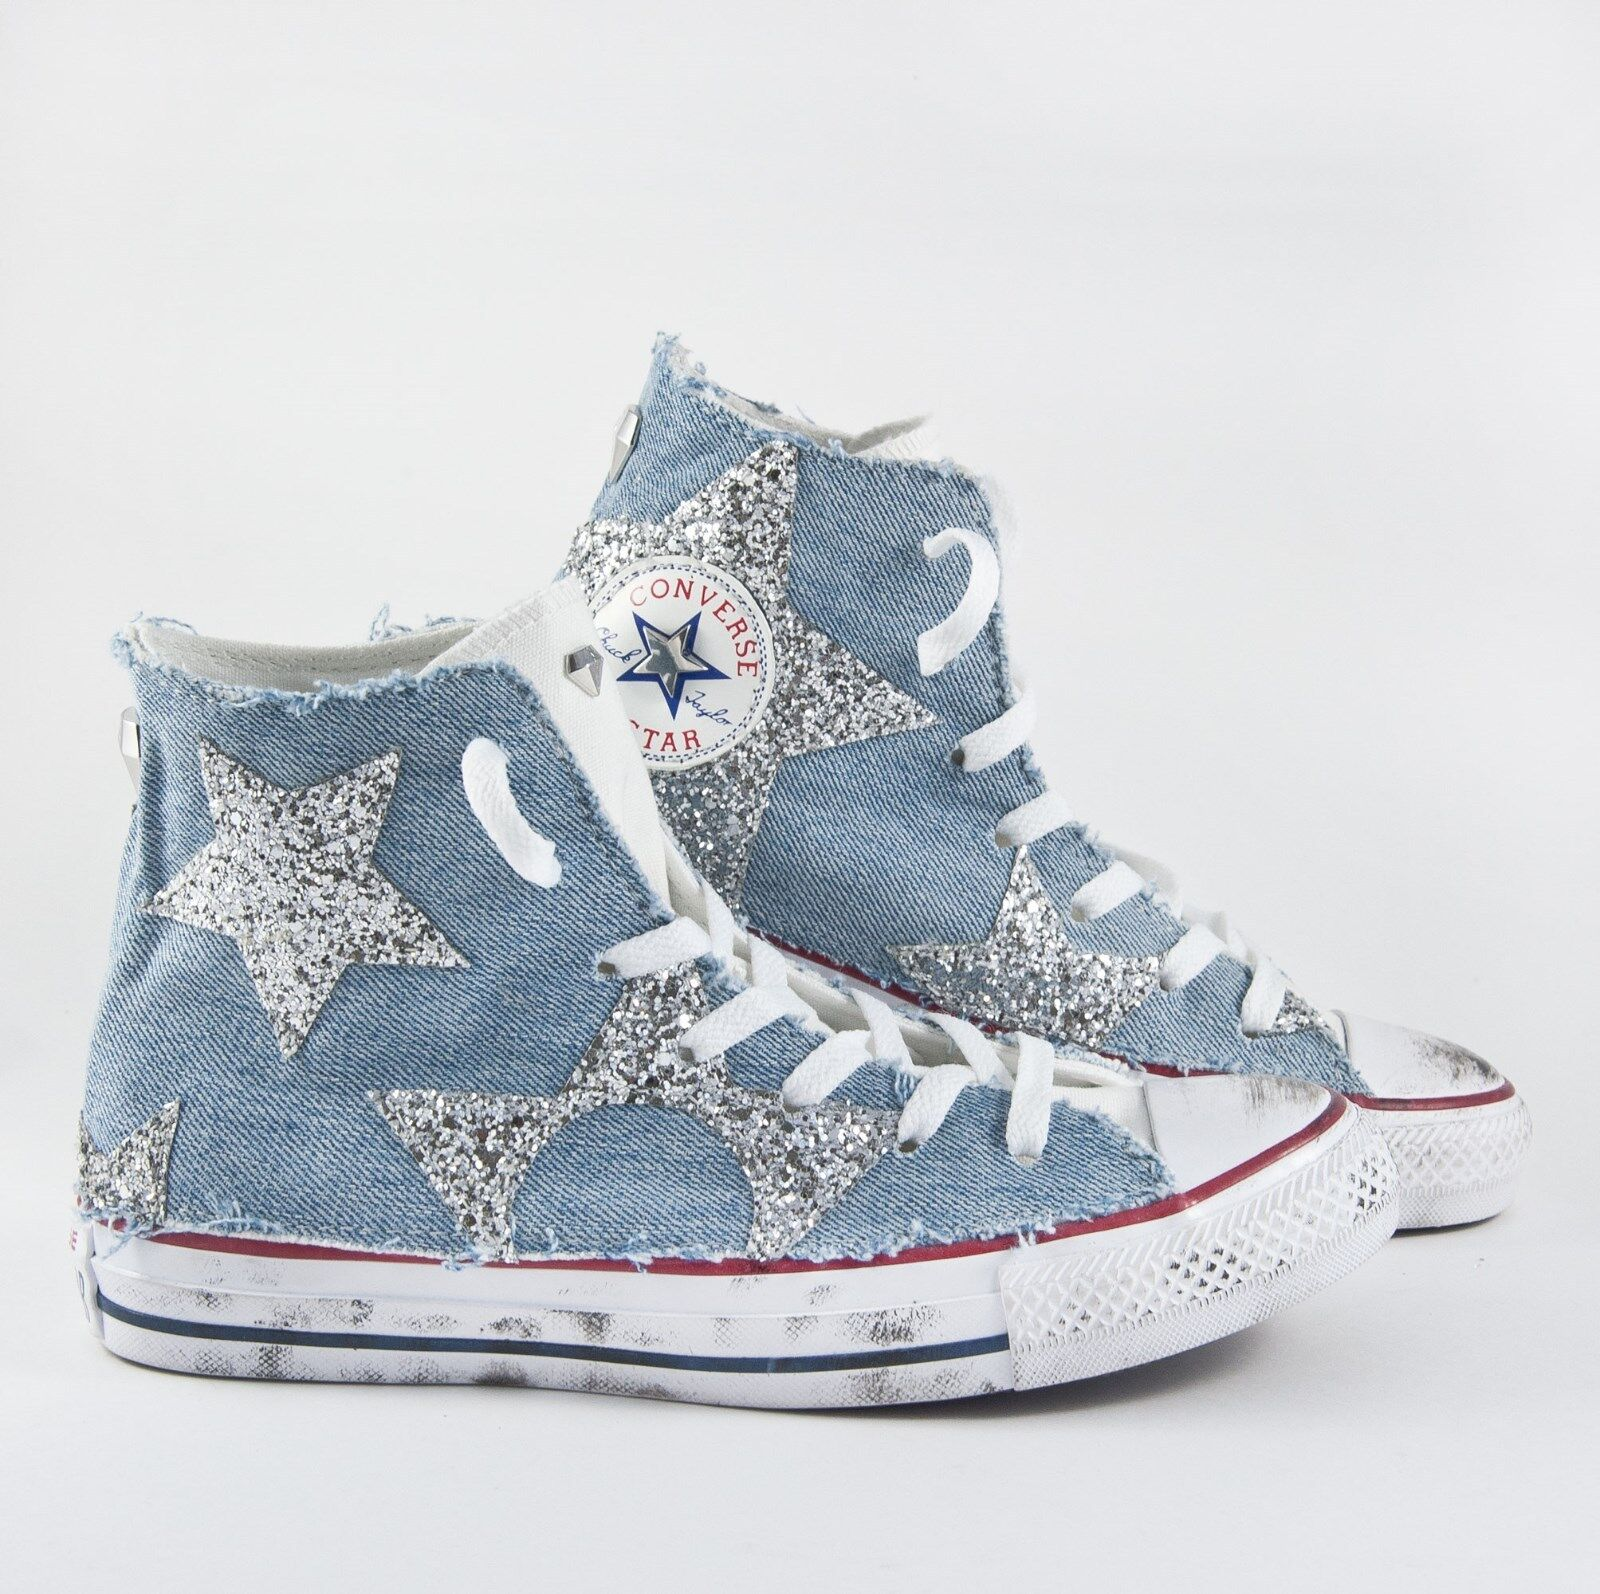 Converse all star Weiß con jeans e stelle in glitter Silber e sporcatura